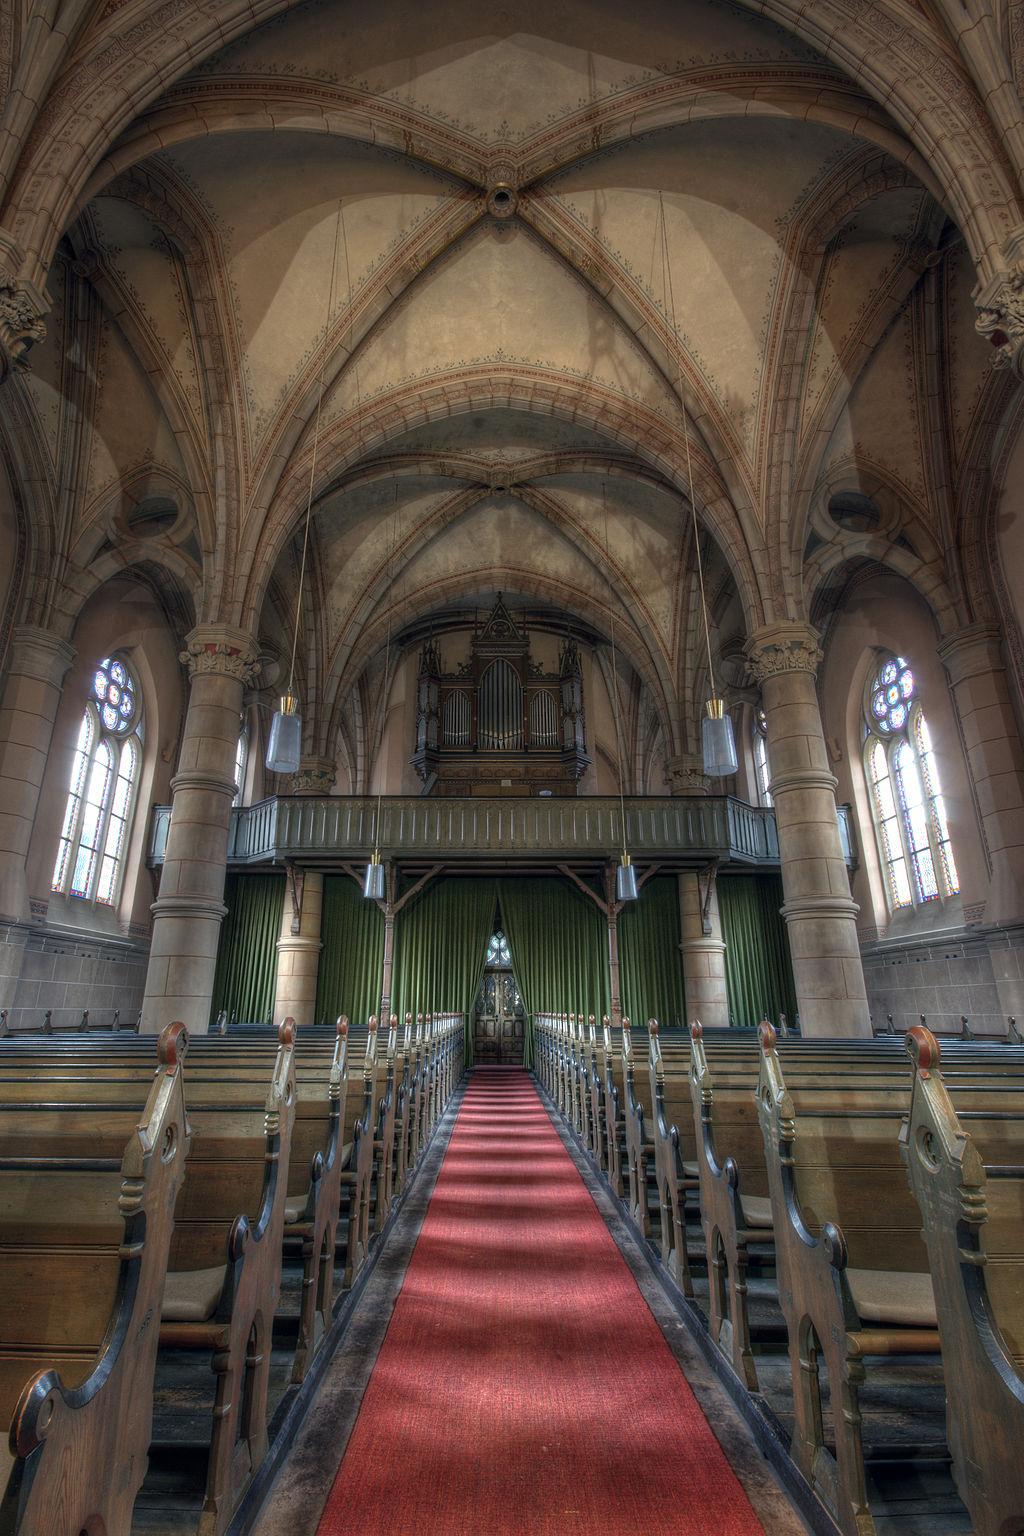 1024px-20110119_120134_Wanfried_ev.Kirche_Eingang-Orgel_m.Licht.jpg